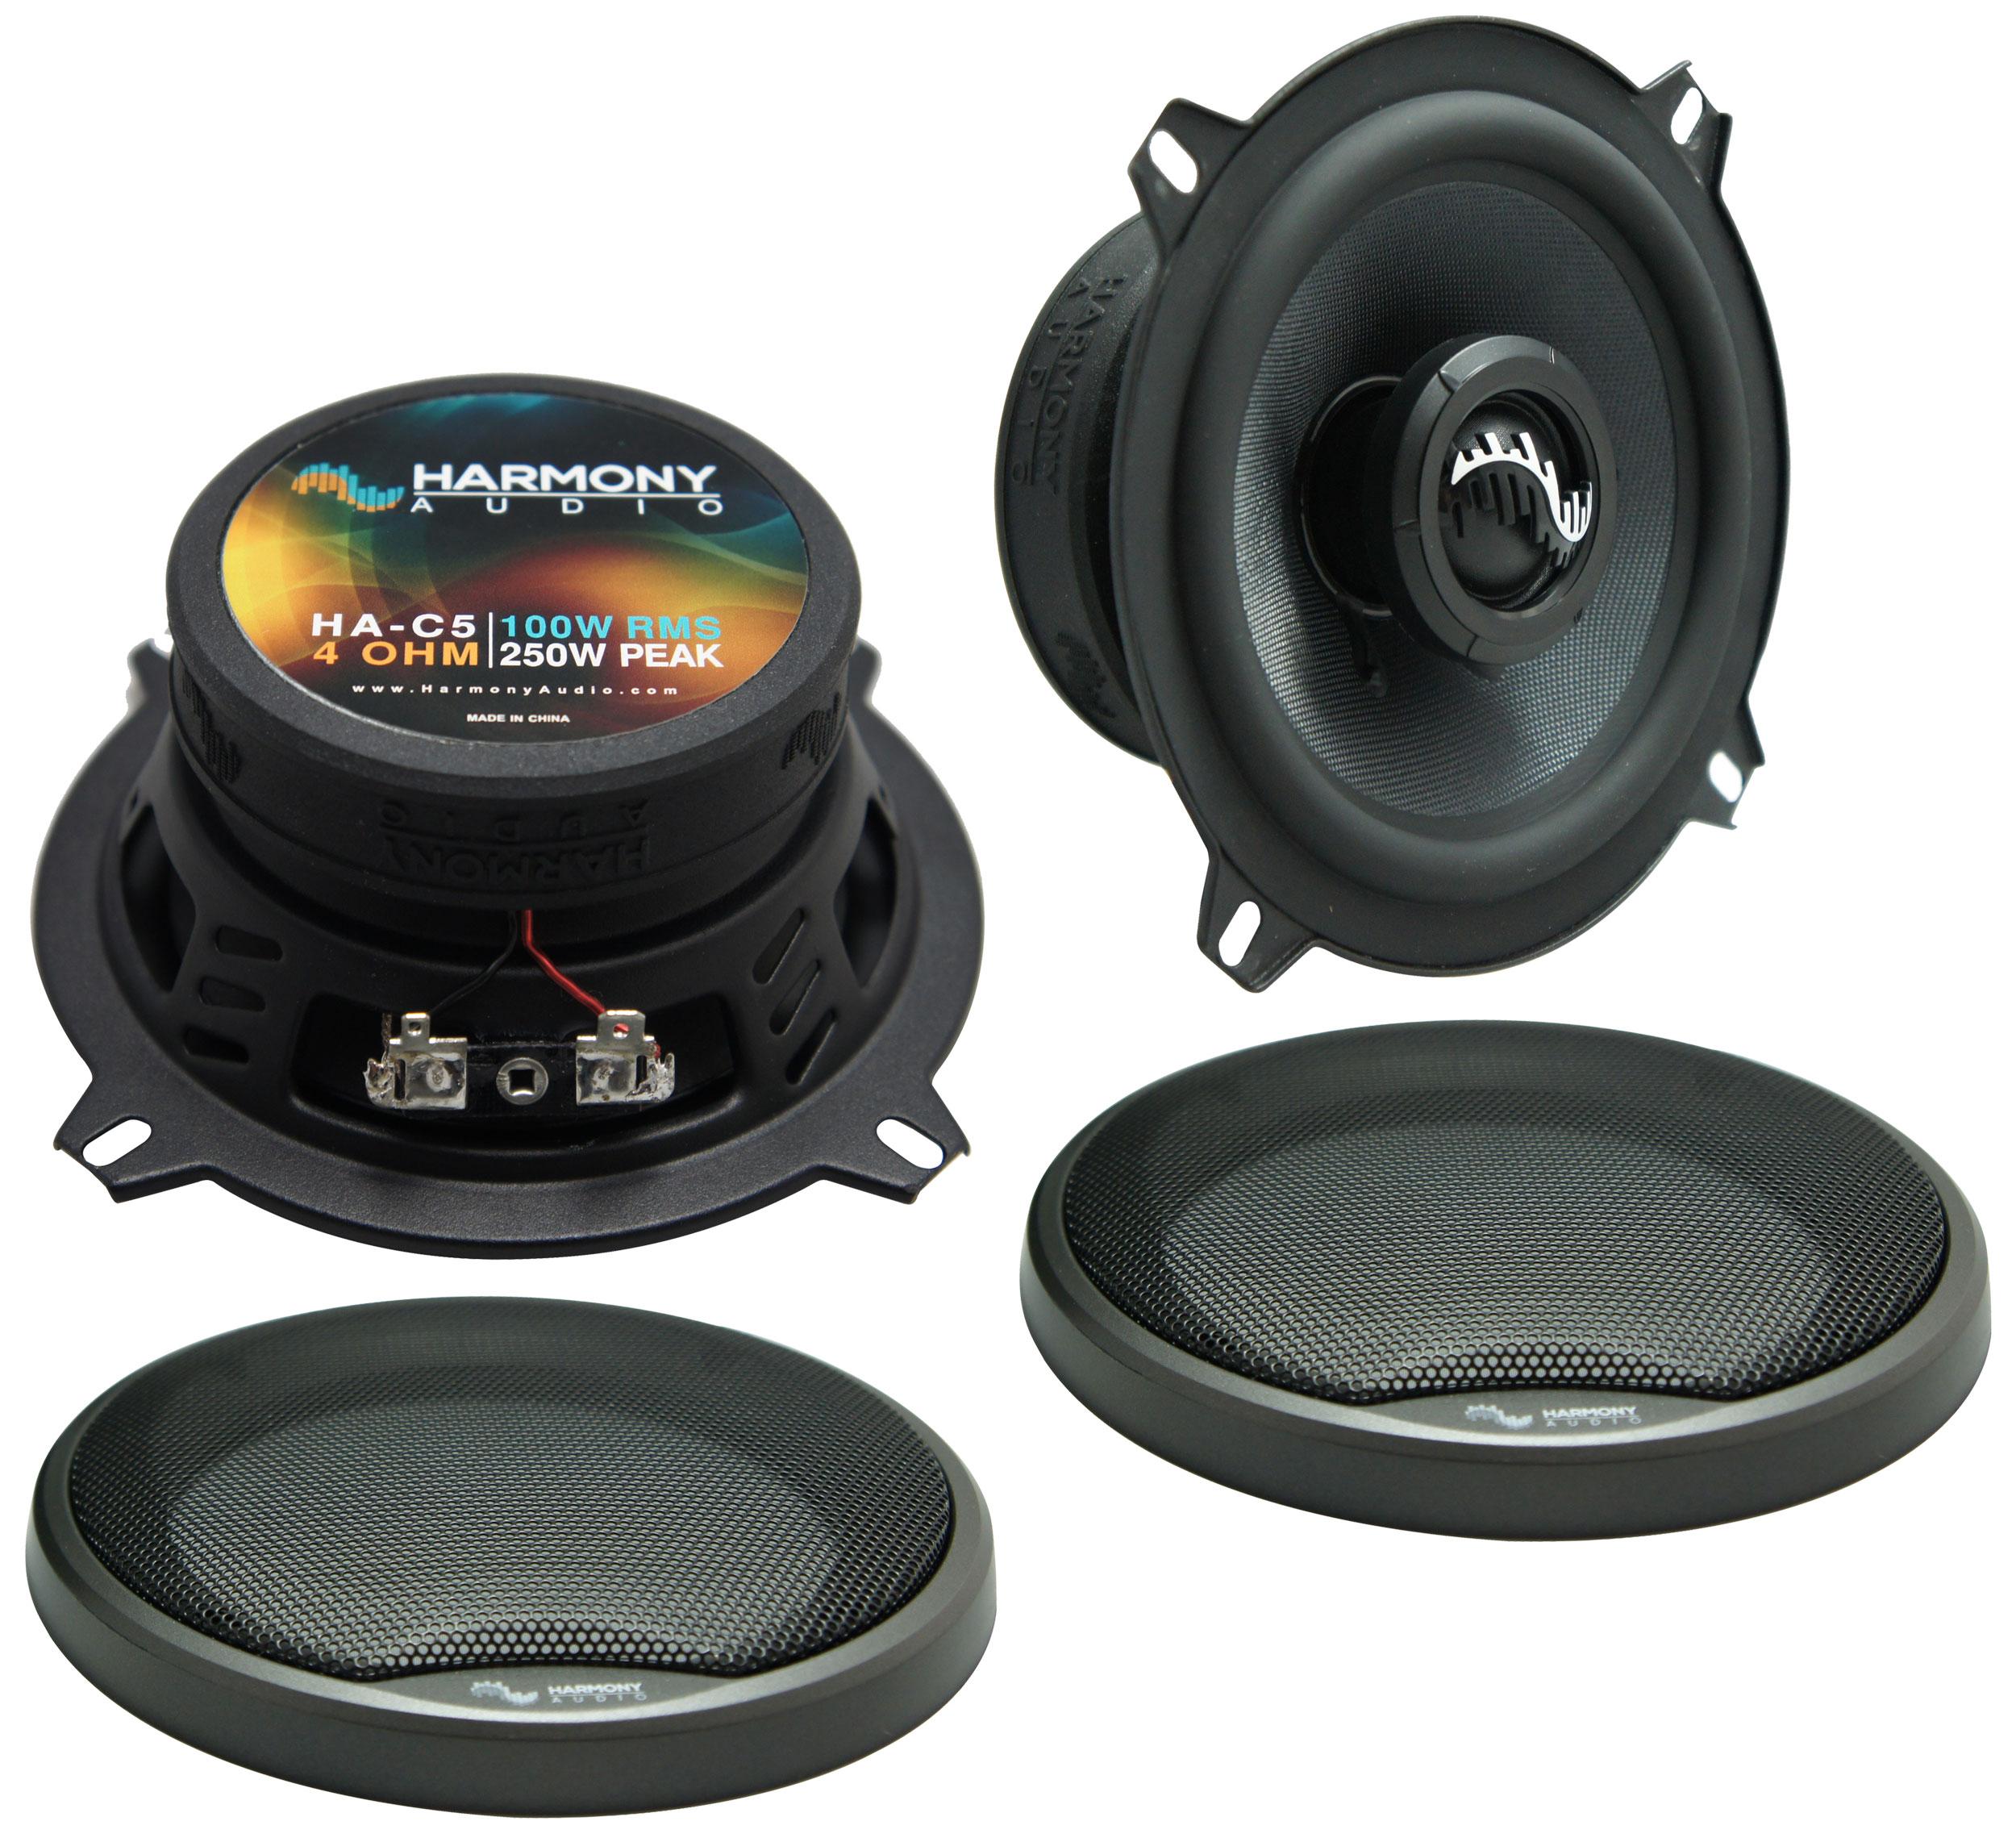 Fits Chevy Silverado 2012-2013 Rear Door Replacement Harmony HA-C5 Premium Speakers